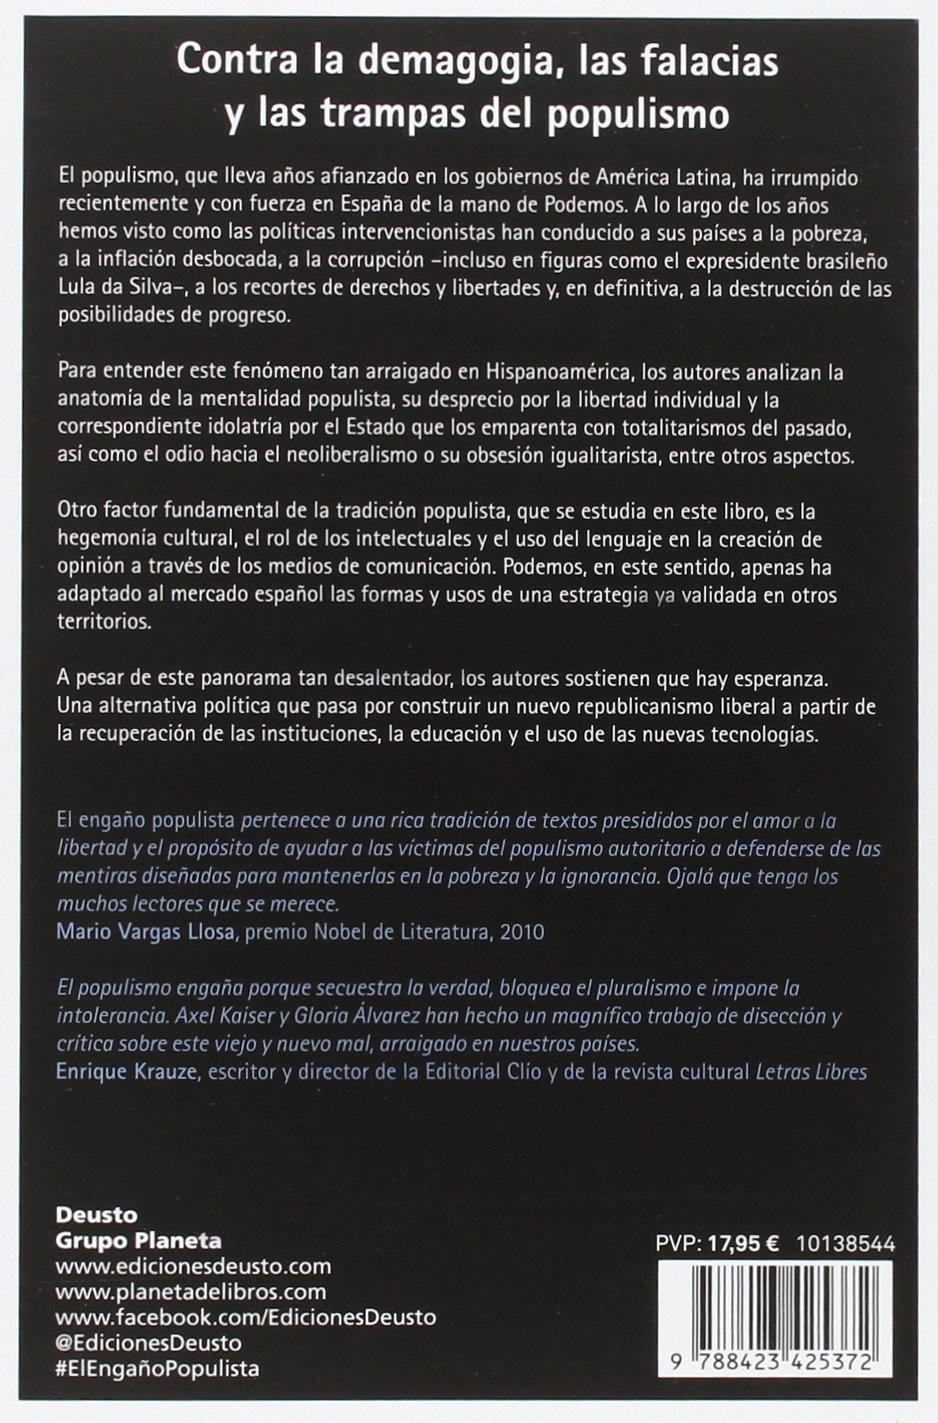 El engaño populista: Axel ; Álvarez Cross, Gloria Kaiser Barents-von  Hohenhagen: 9788423425372: Books - Amazon.ca